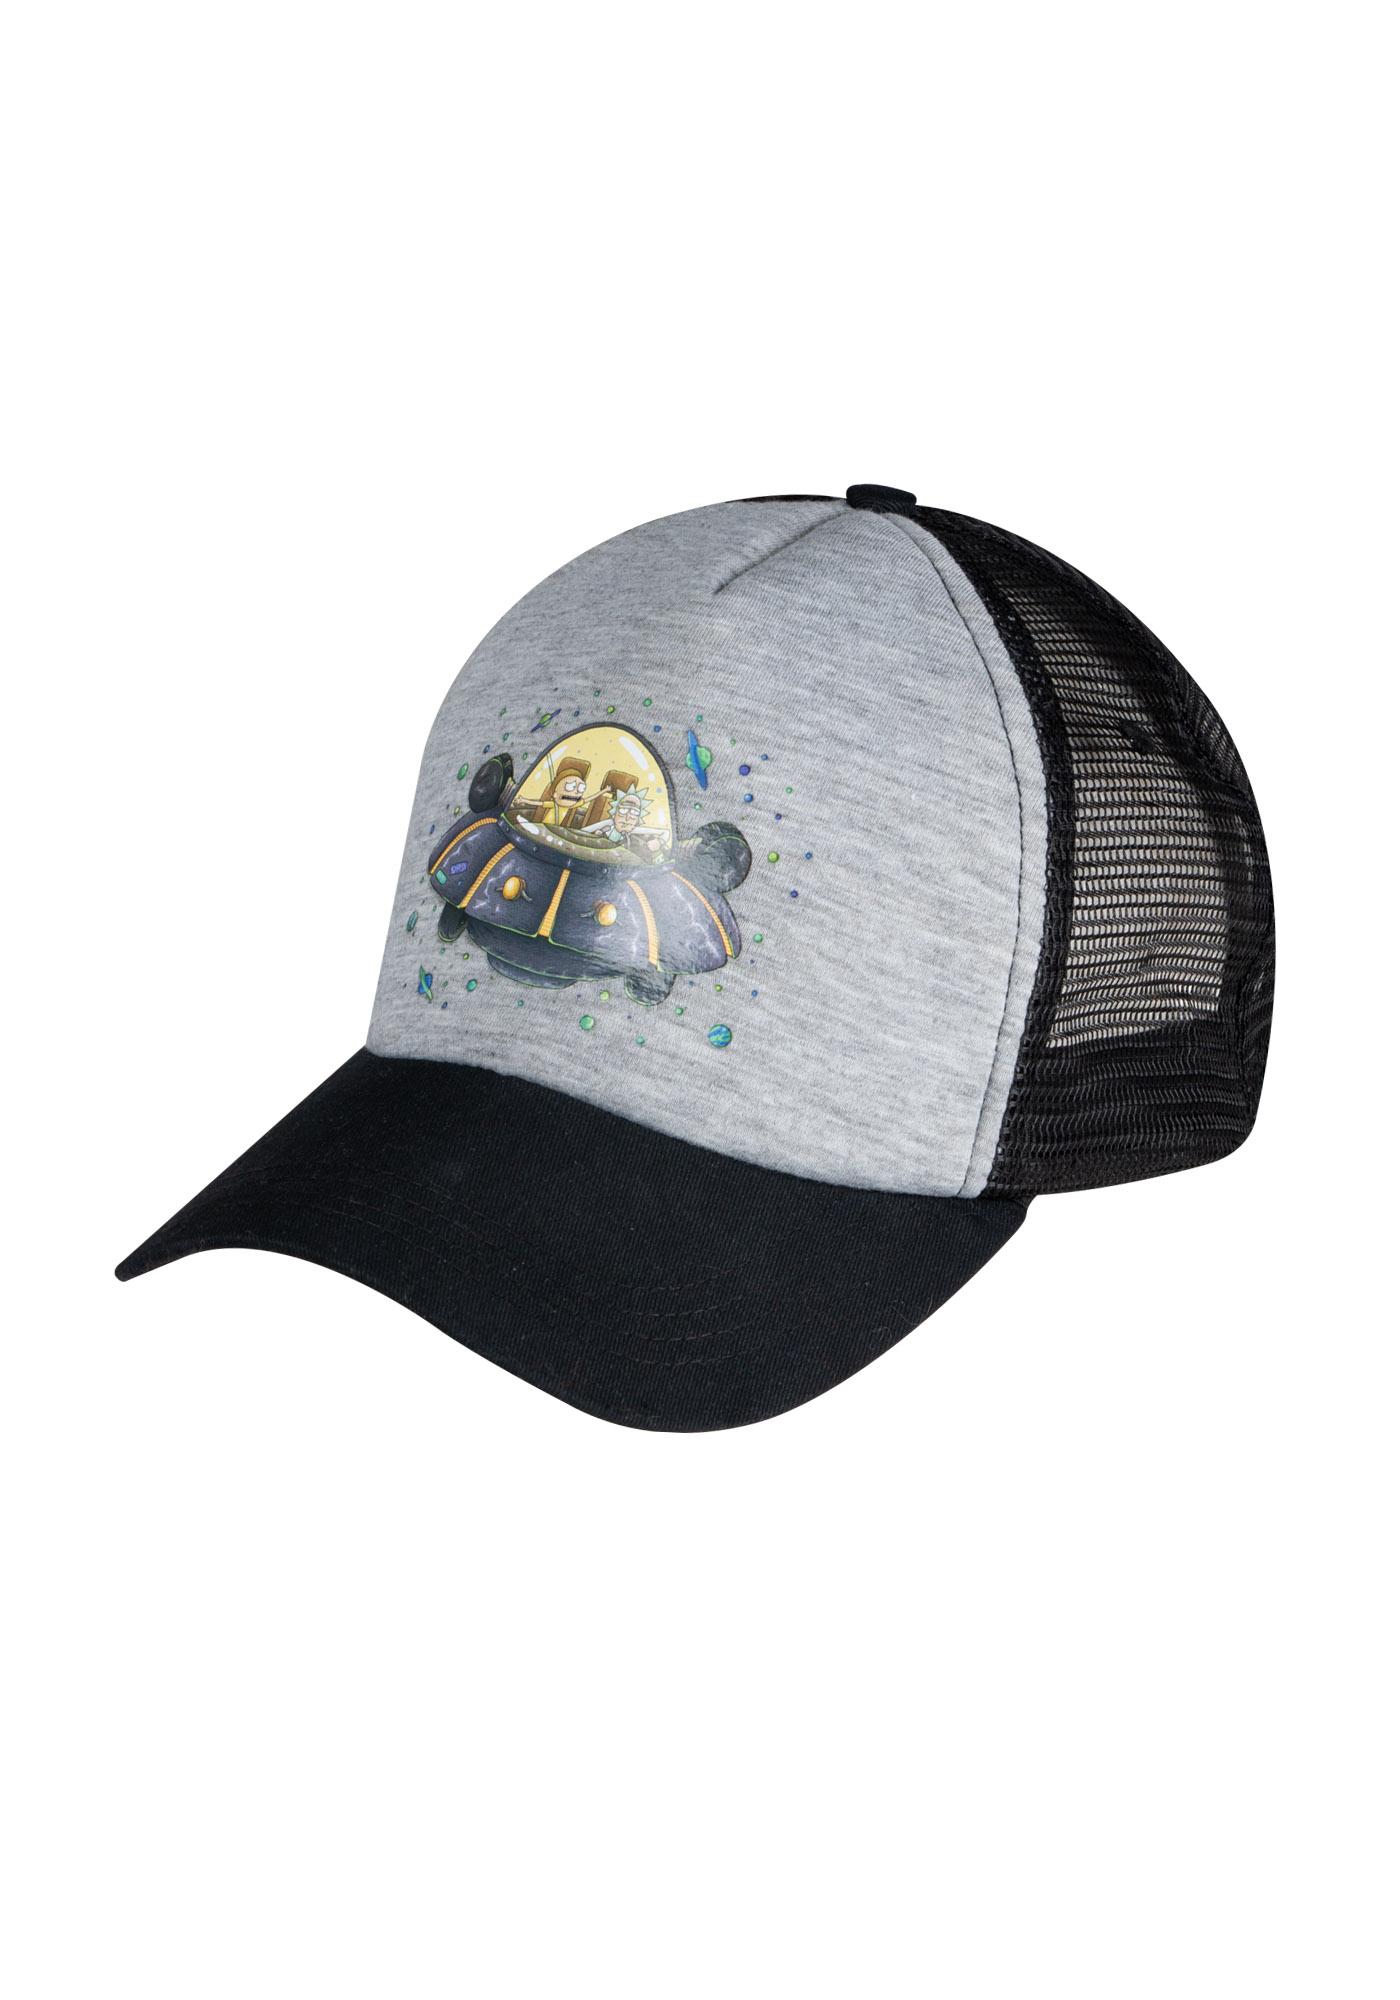 69a0bb81ac2da Men s Rick   Morty Baseball Hat